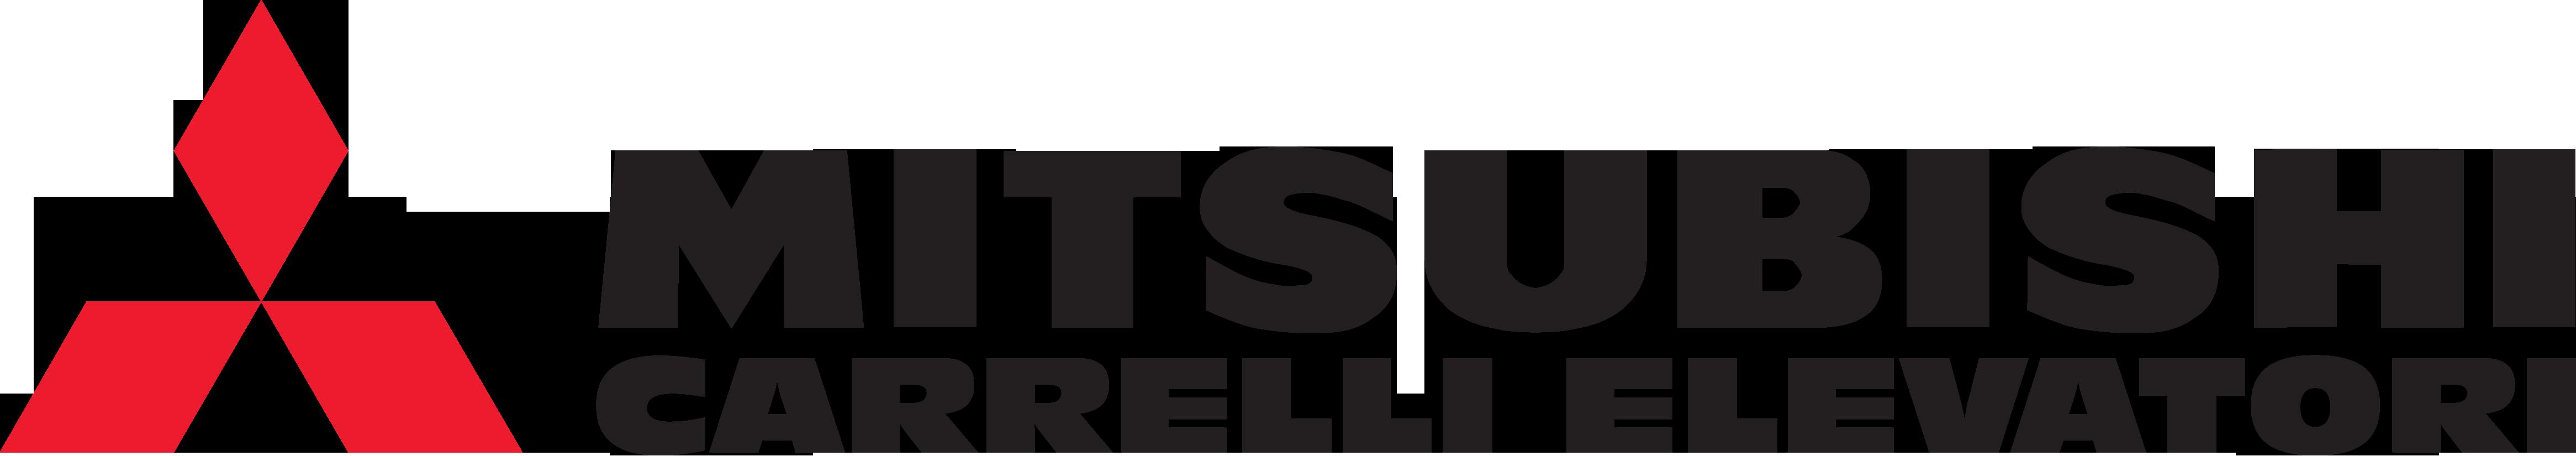 logo mitsubishi carrelli elevatori bologna